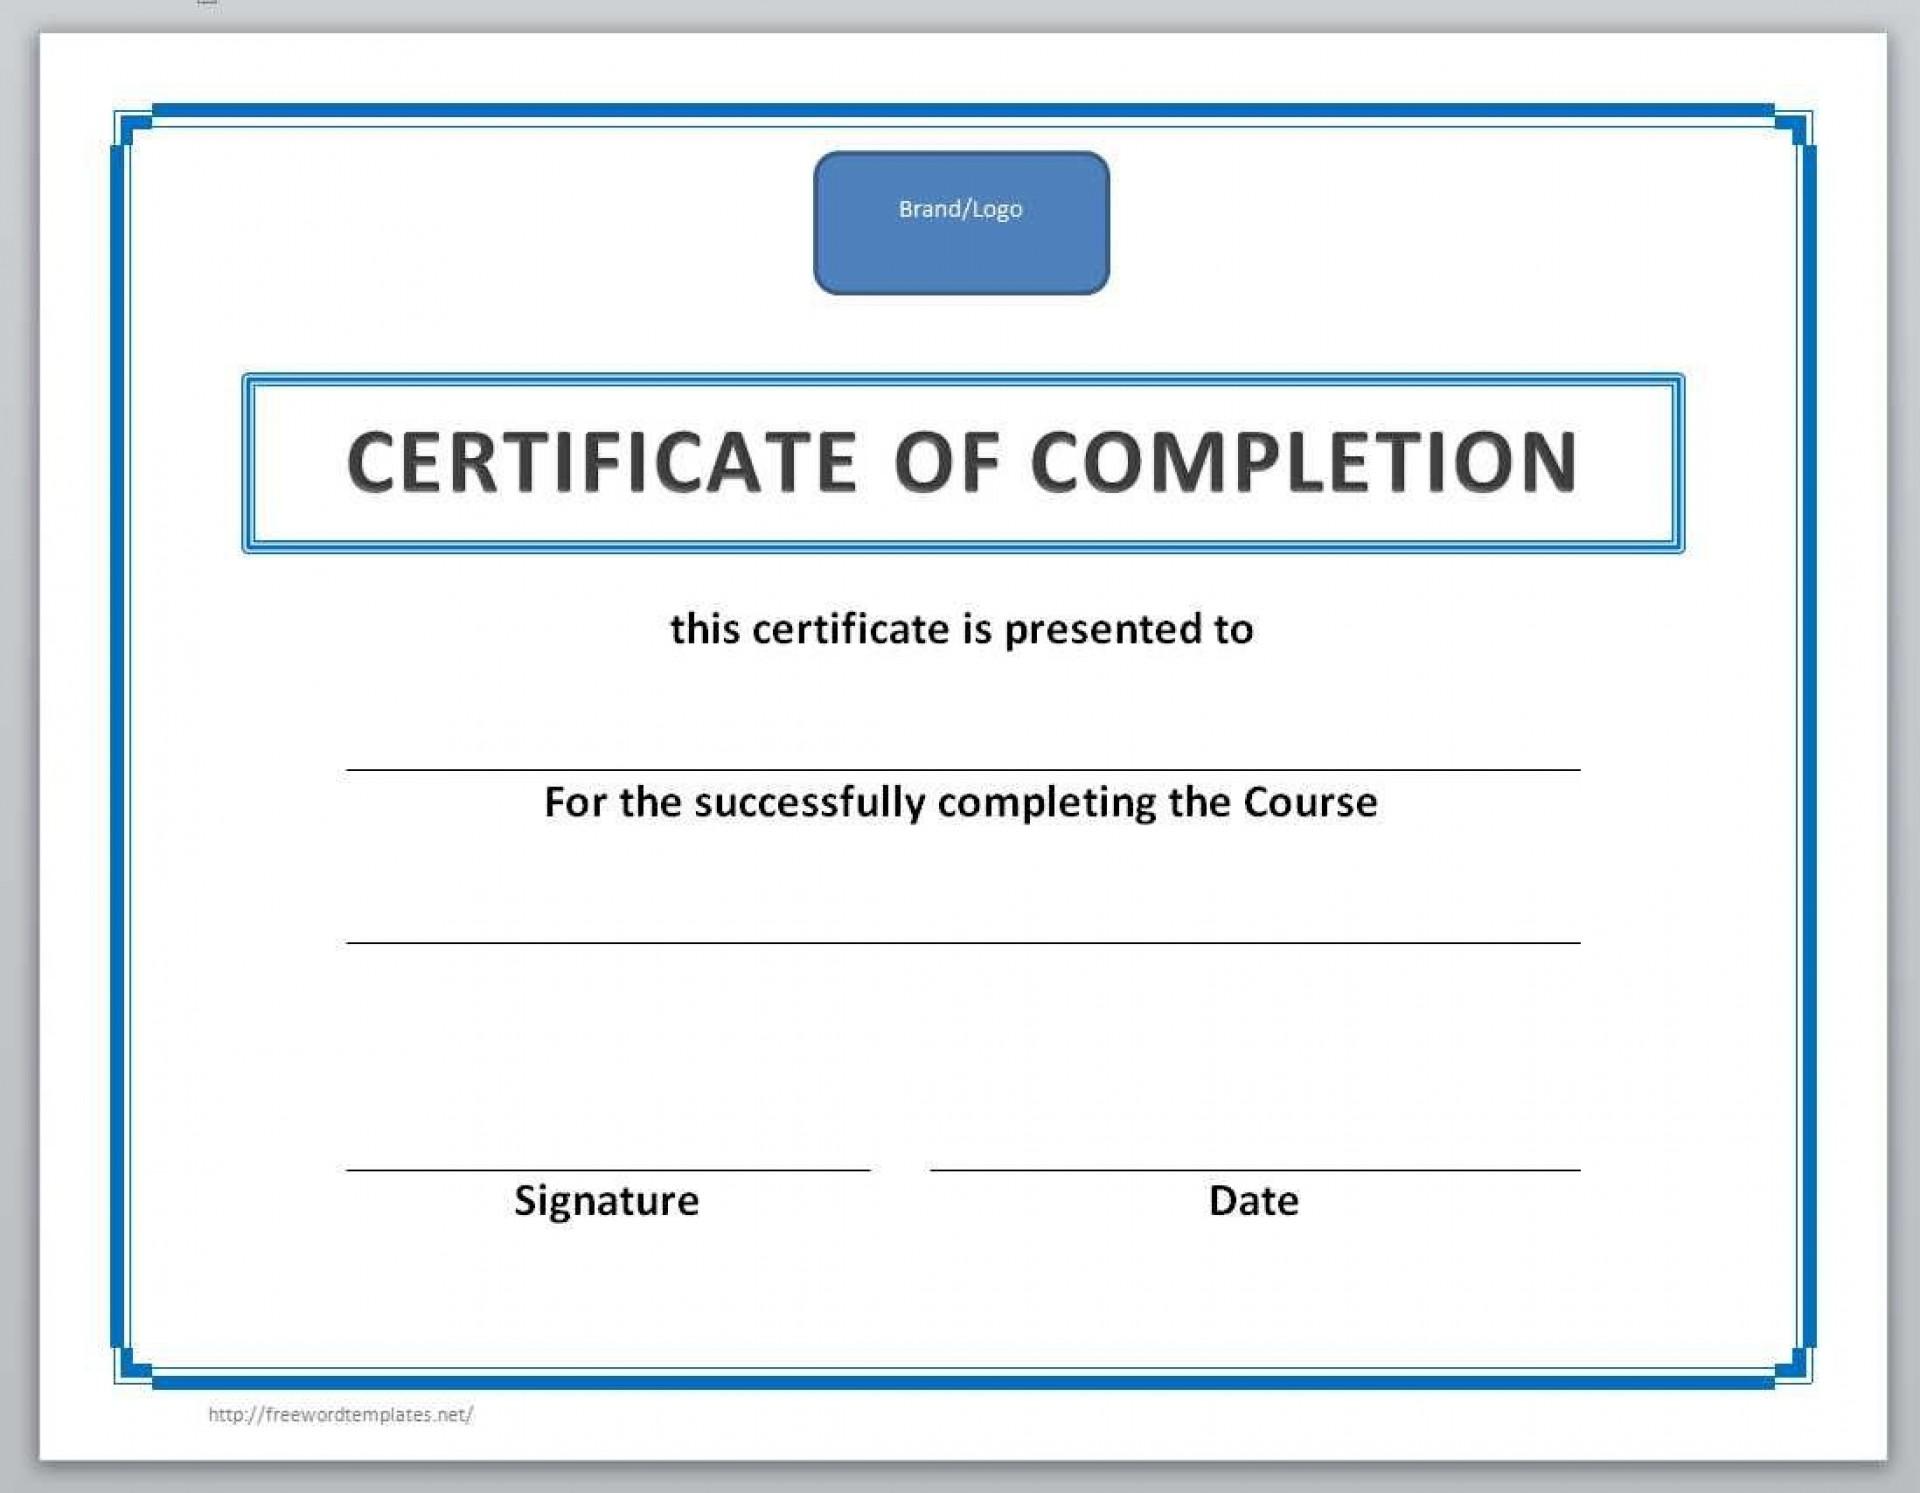 003 Singular Free Certificate Template Word Example  Blank For Microsoft Award Border Download1920